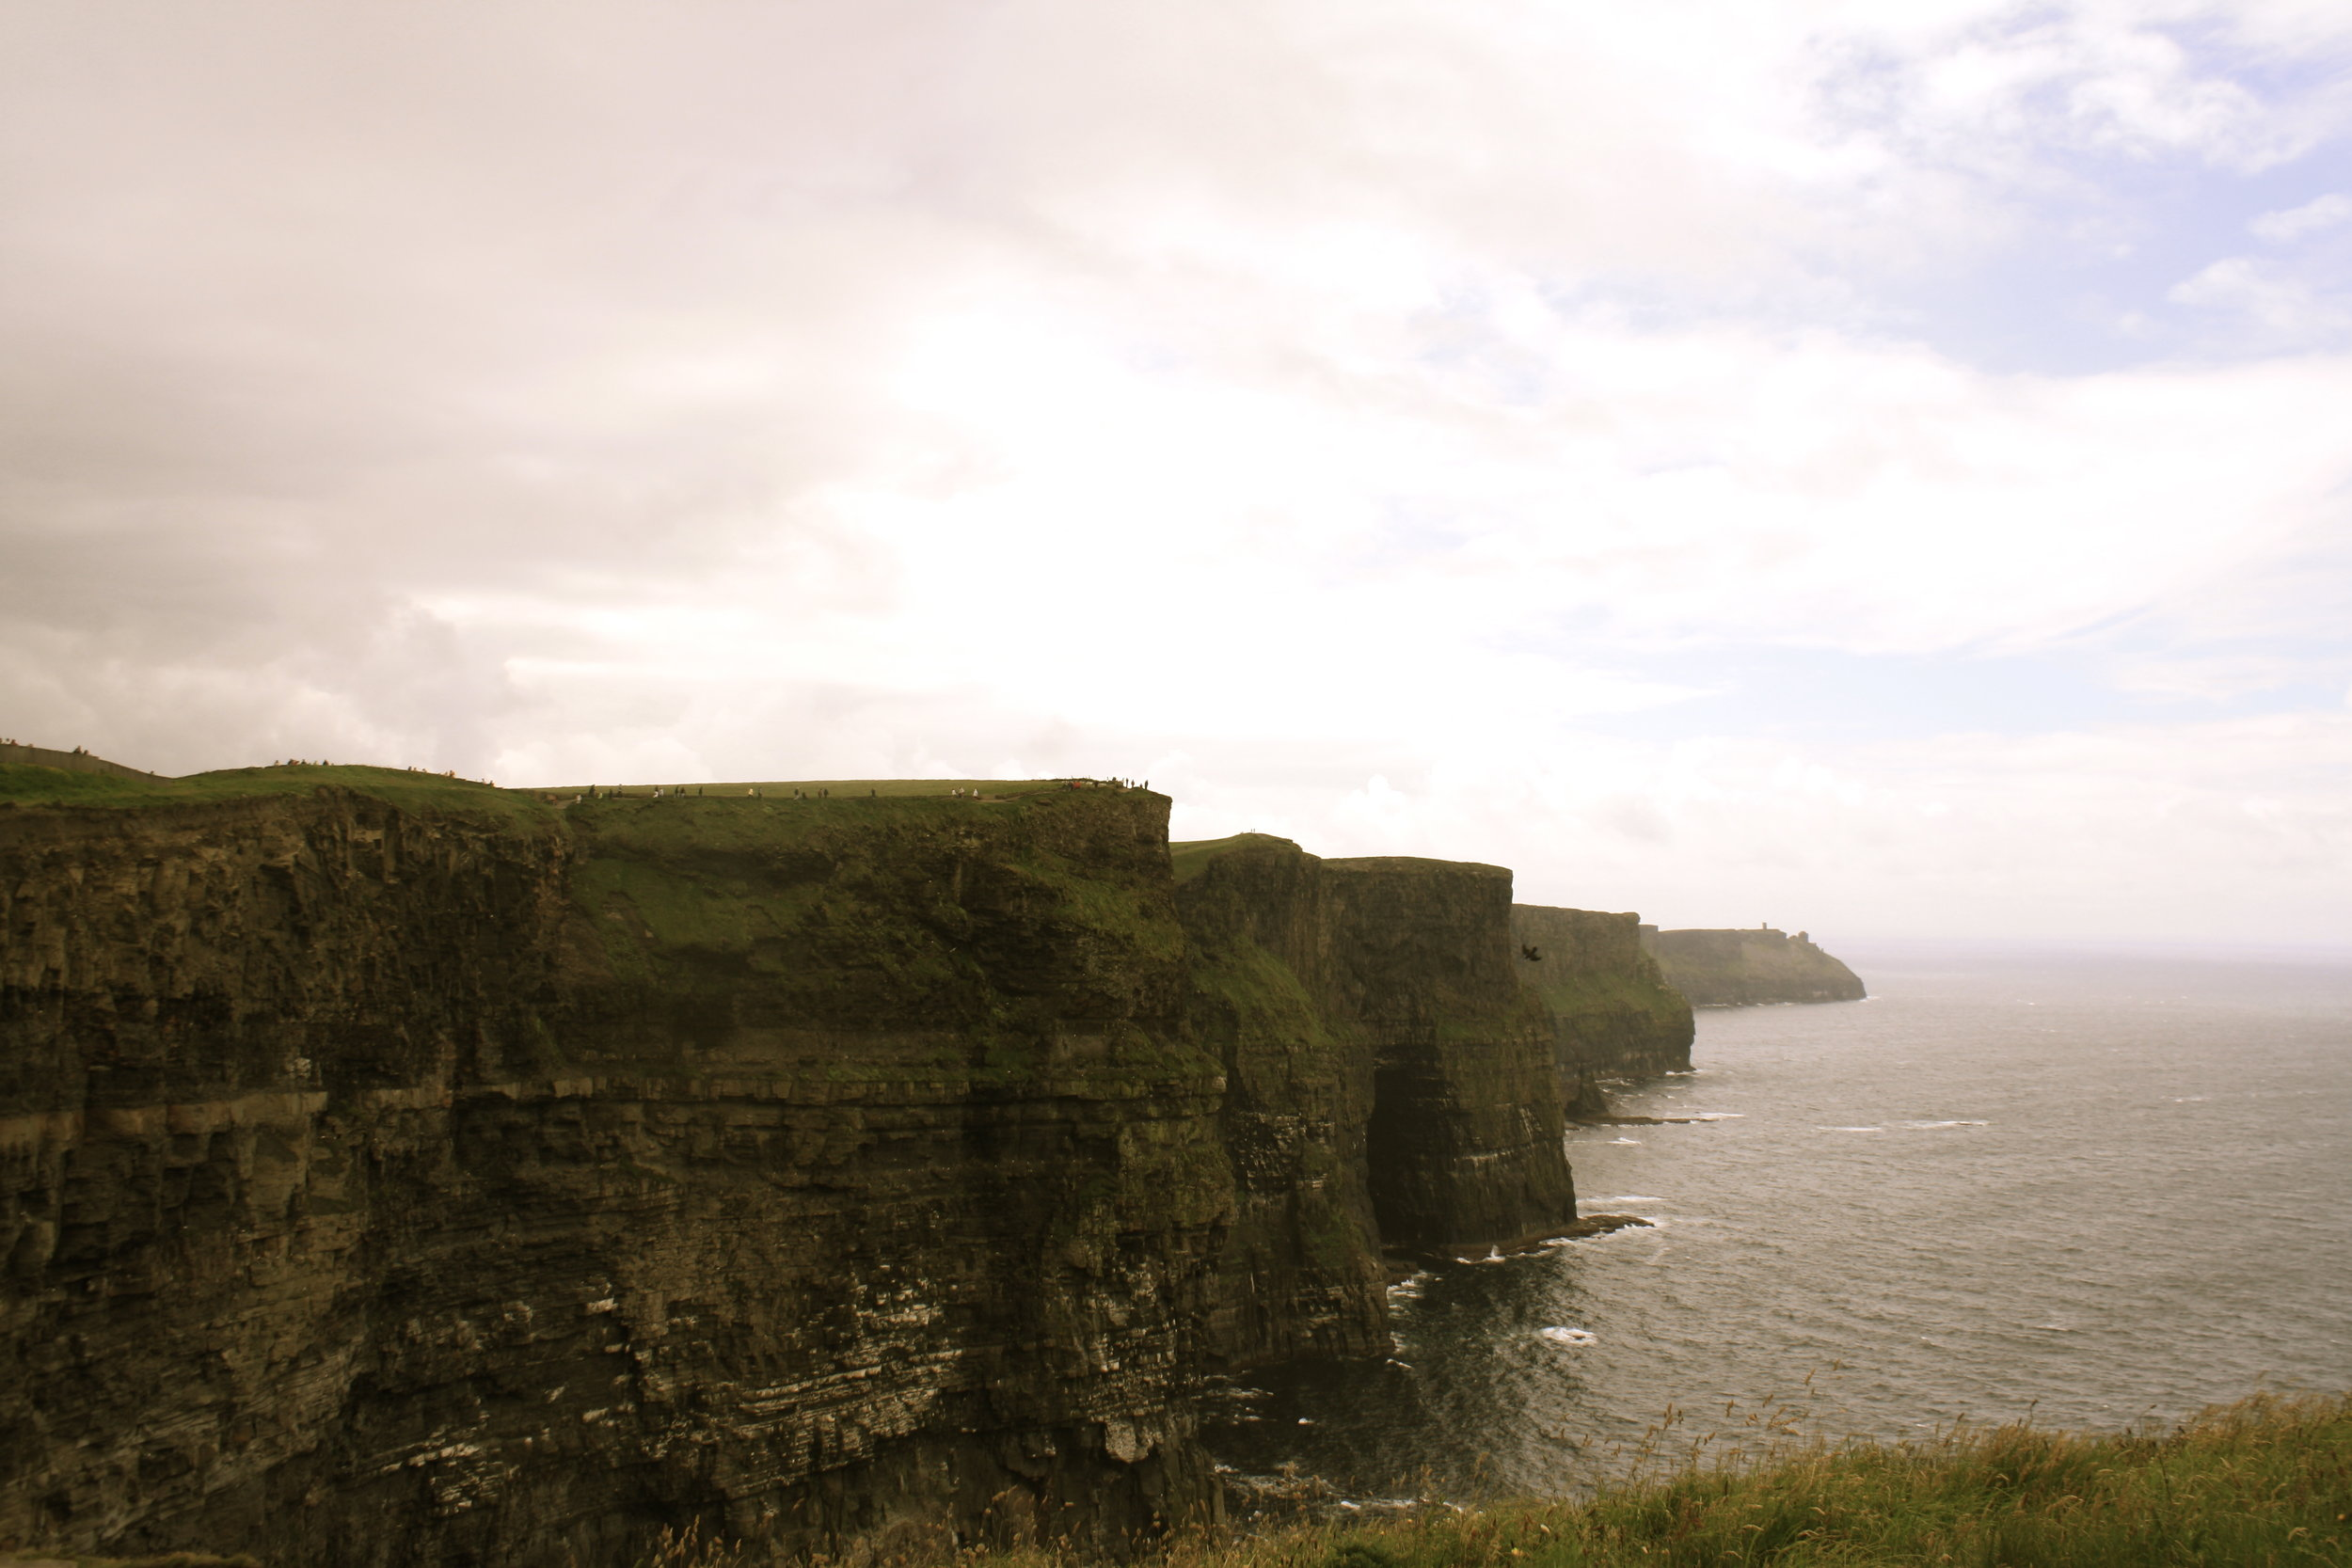 IRELAND - 7.9.16